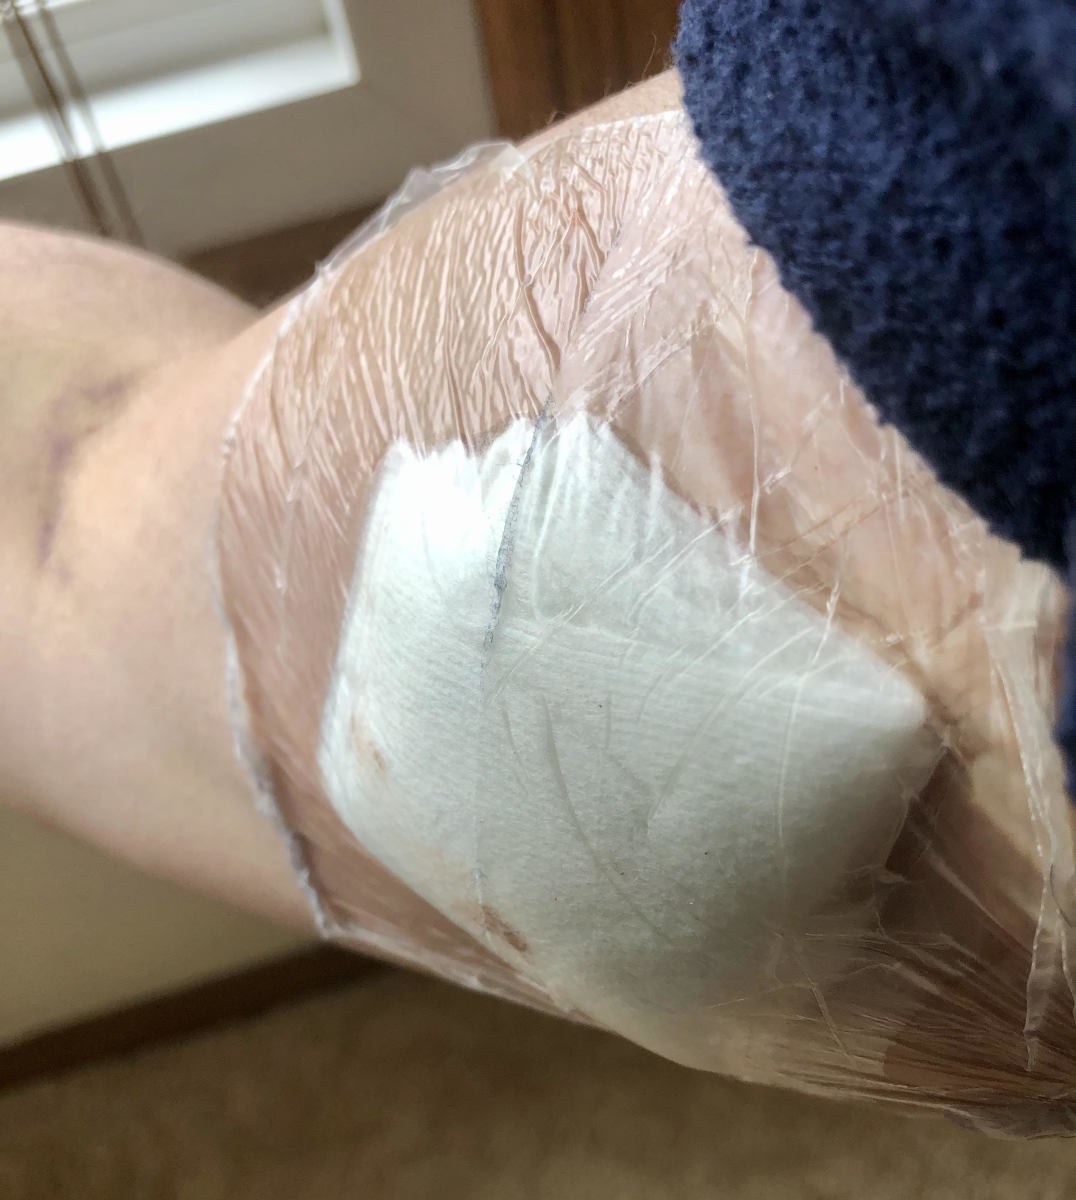 Midline bandage.